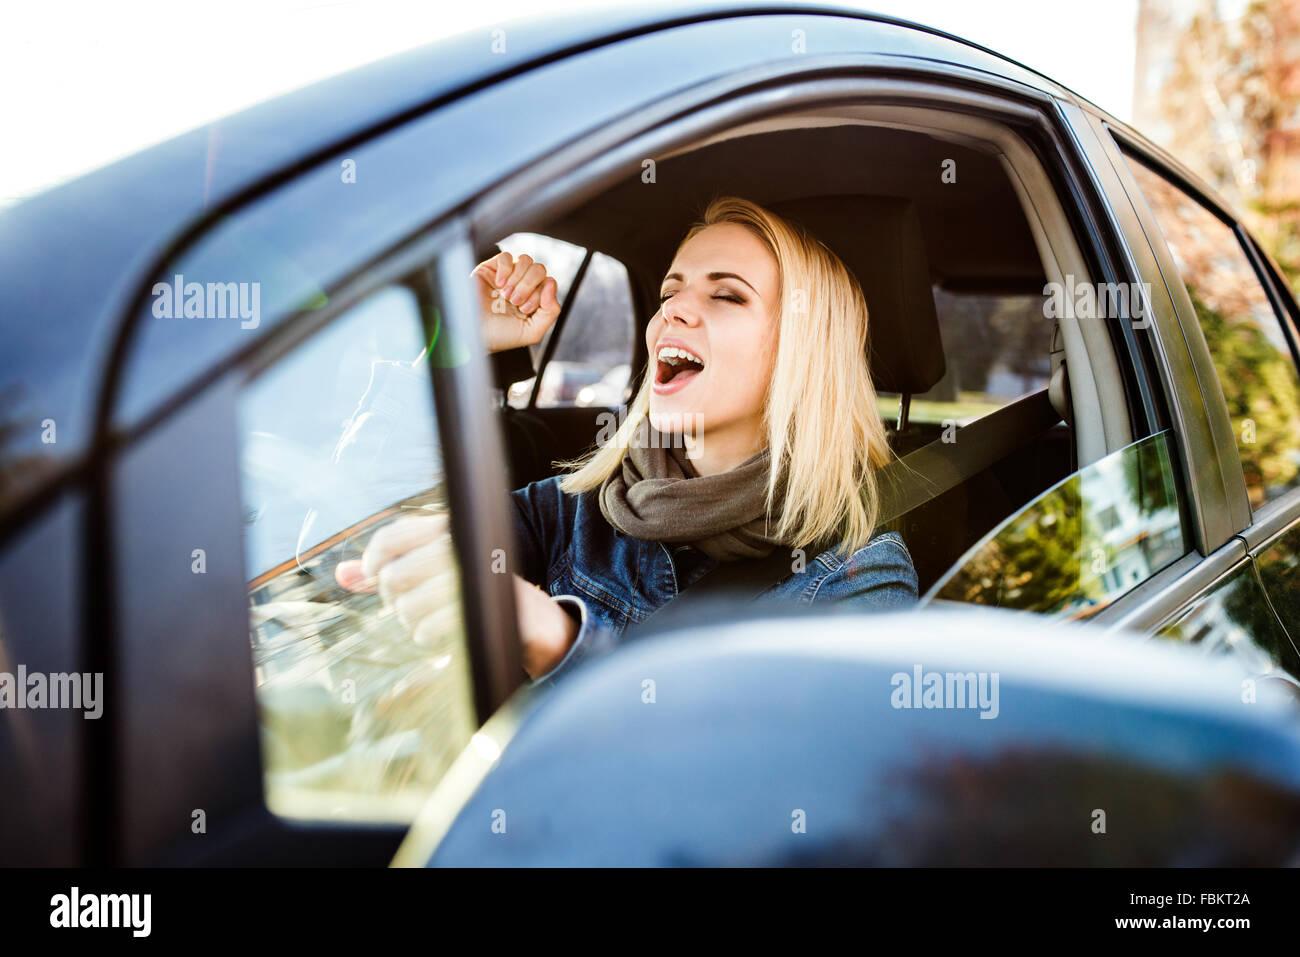 Woman driving a car Photo Stock